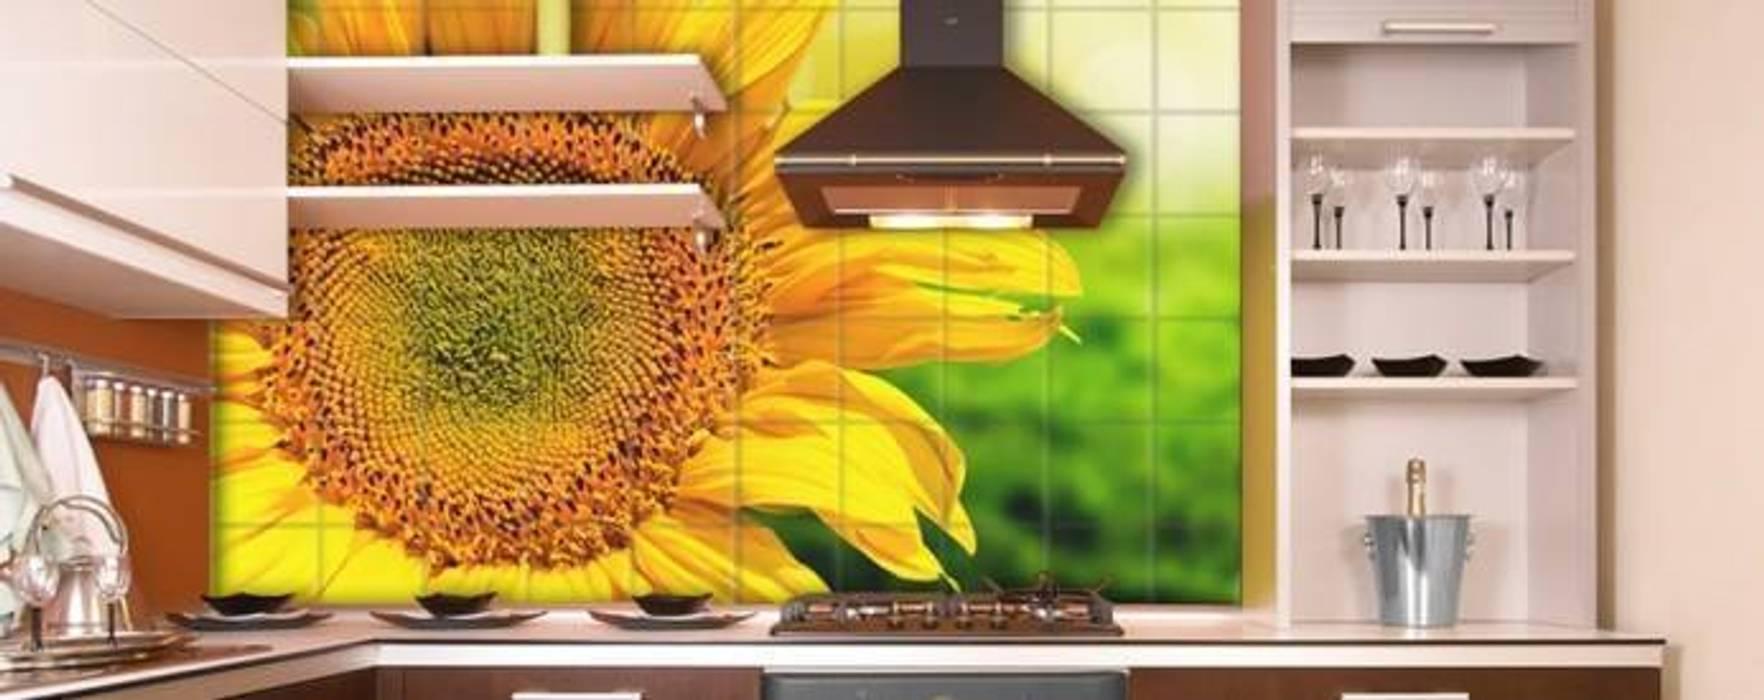 Sunflower Mural Tile Fire Ltd. ห้องครัว